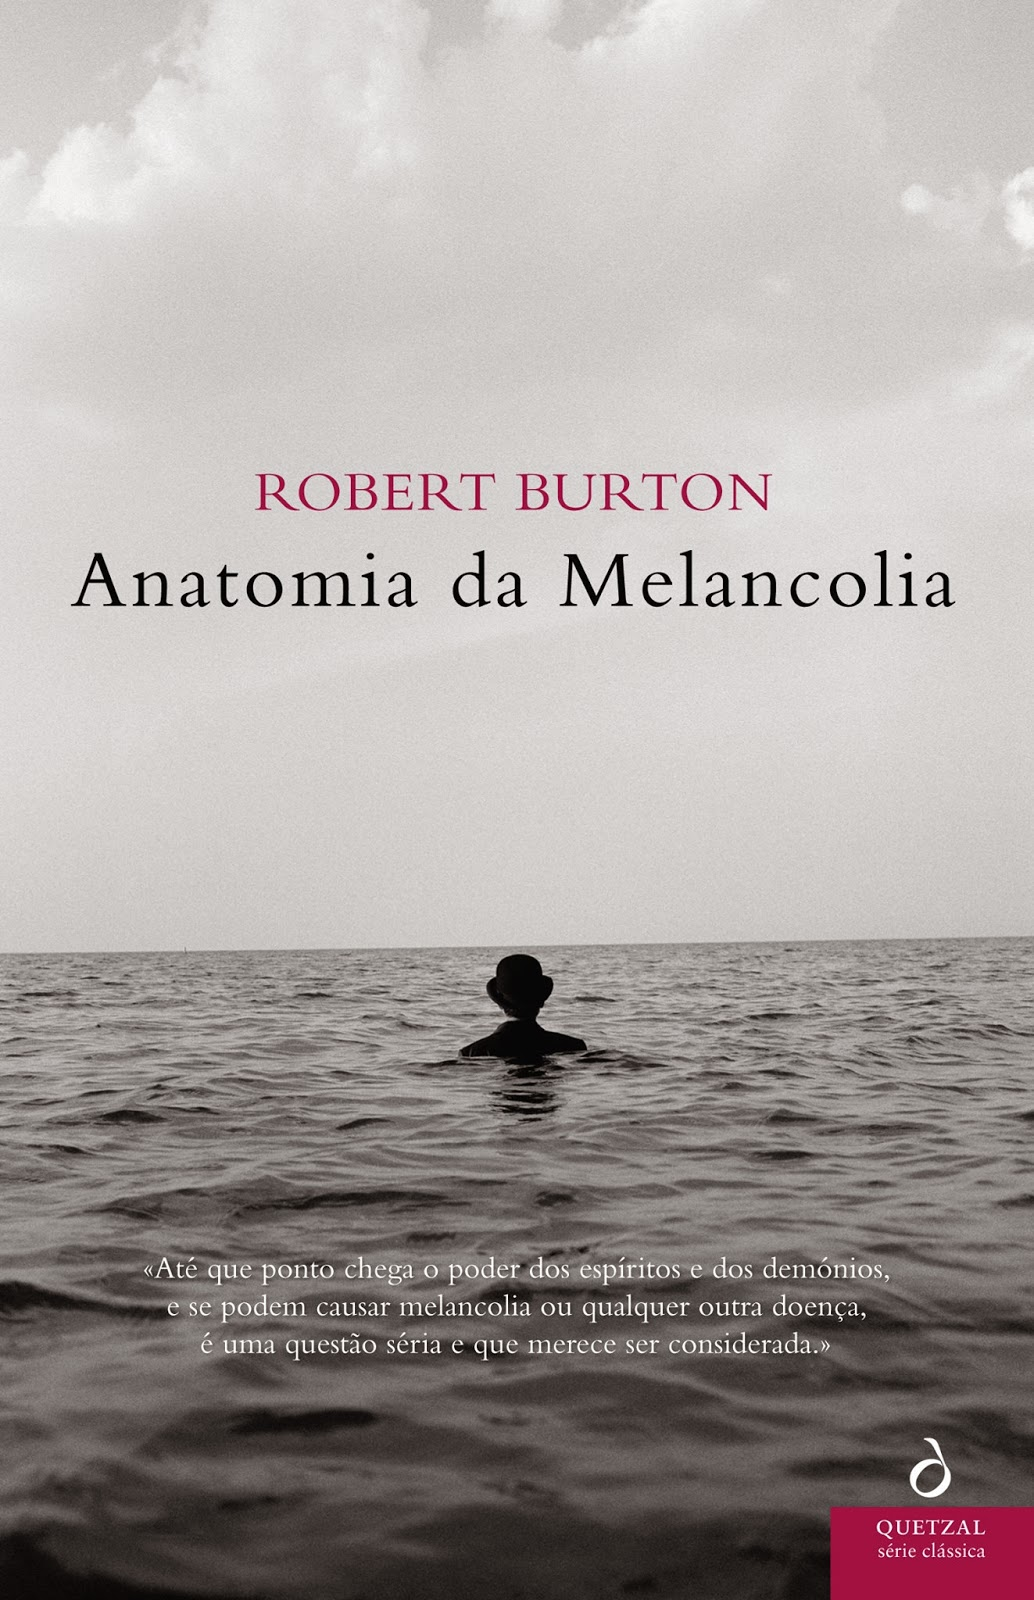 Anatomia da Melancolia Robert Burton